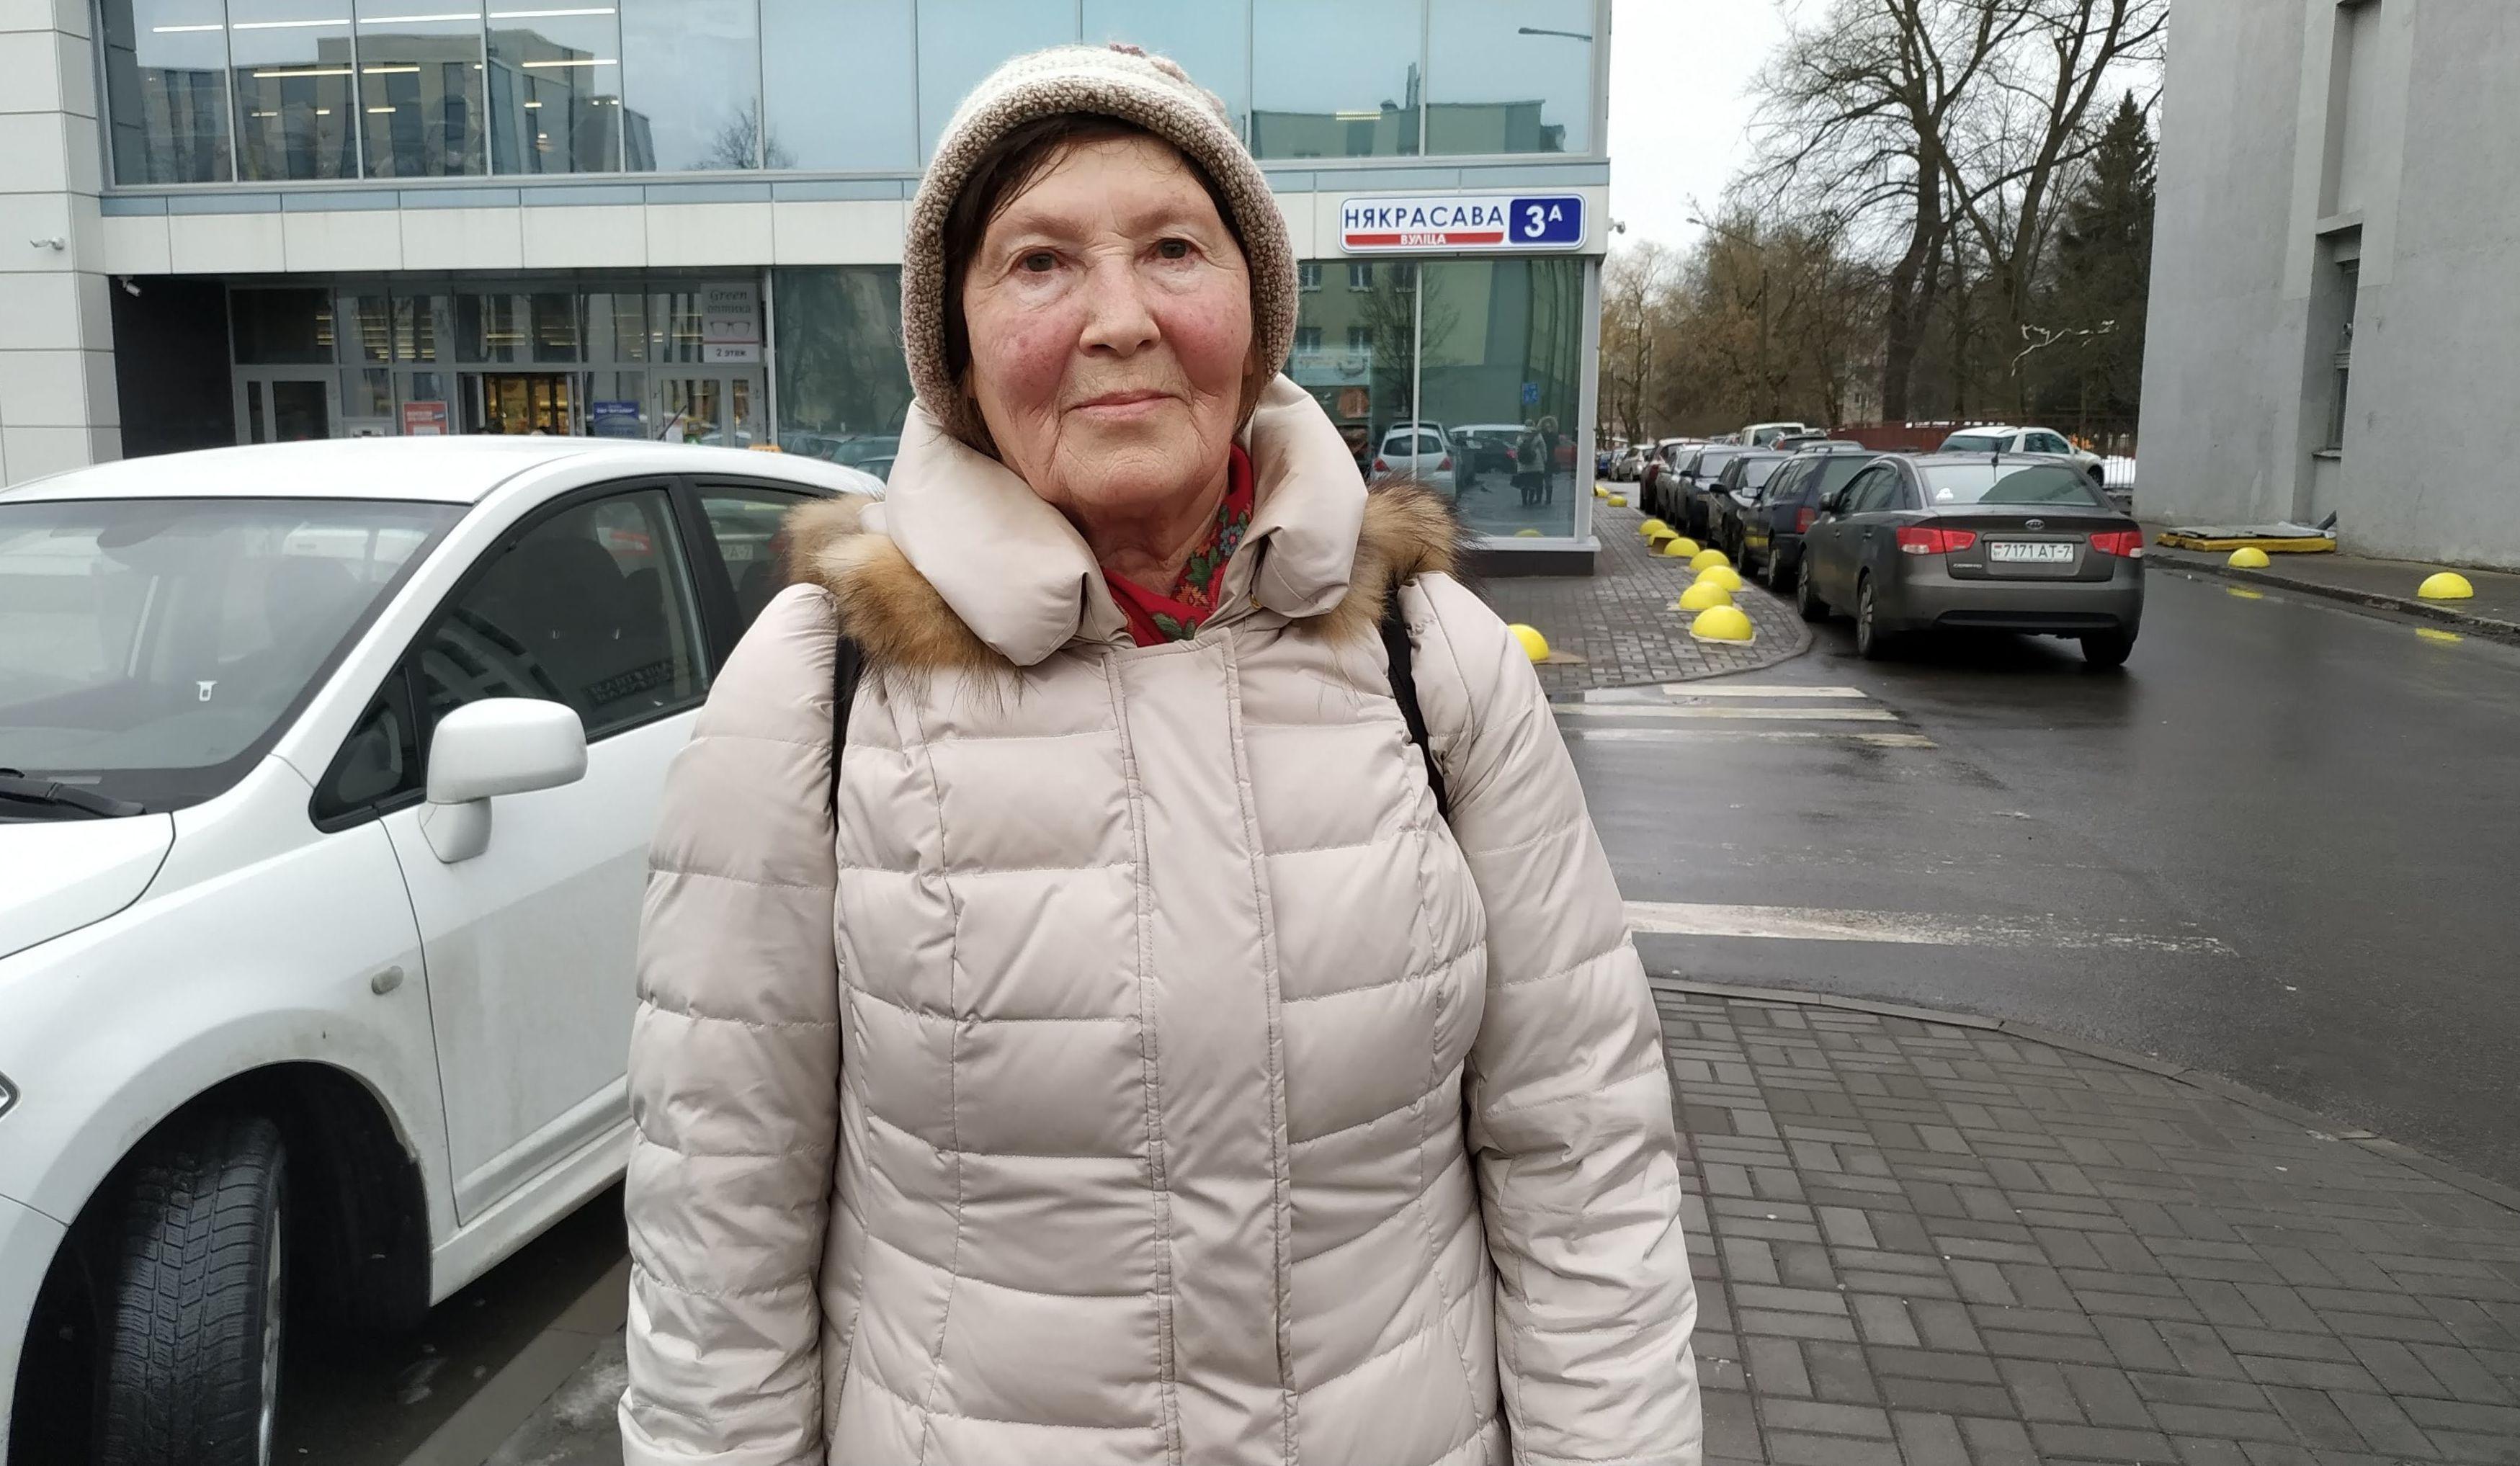 Галина Григорьевна в Беларуси совсем одна, все ее родственники живут в Сибири